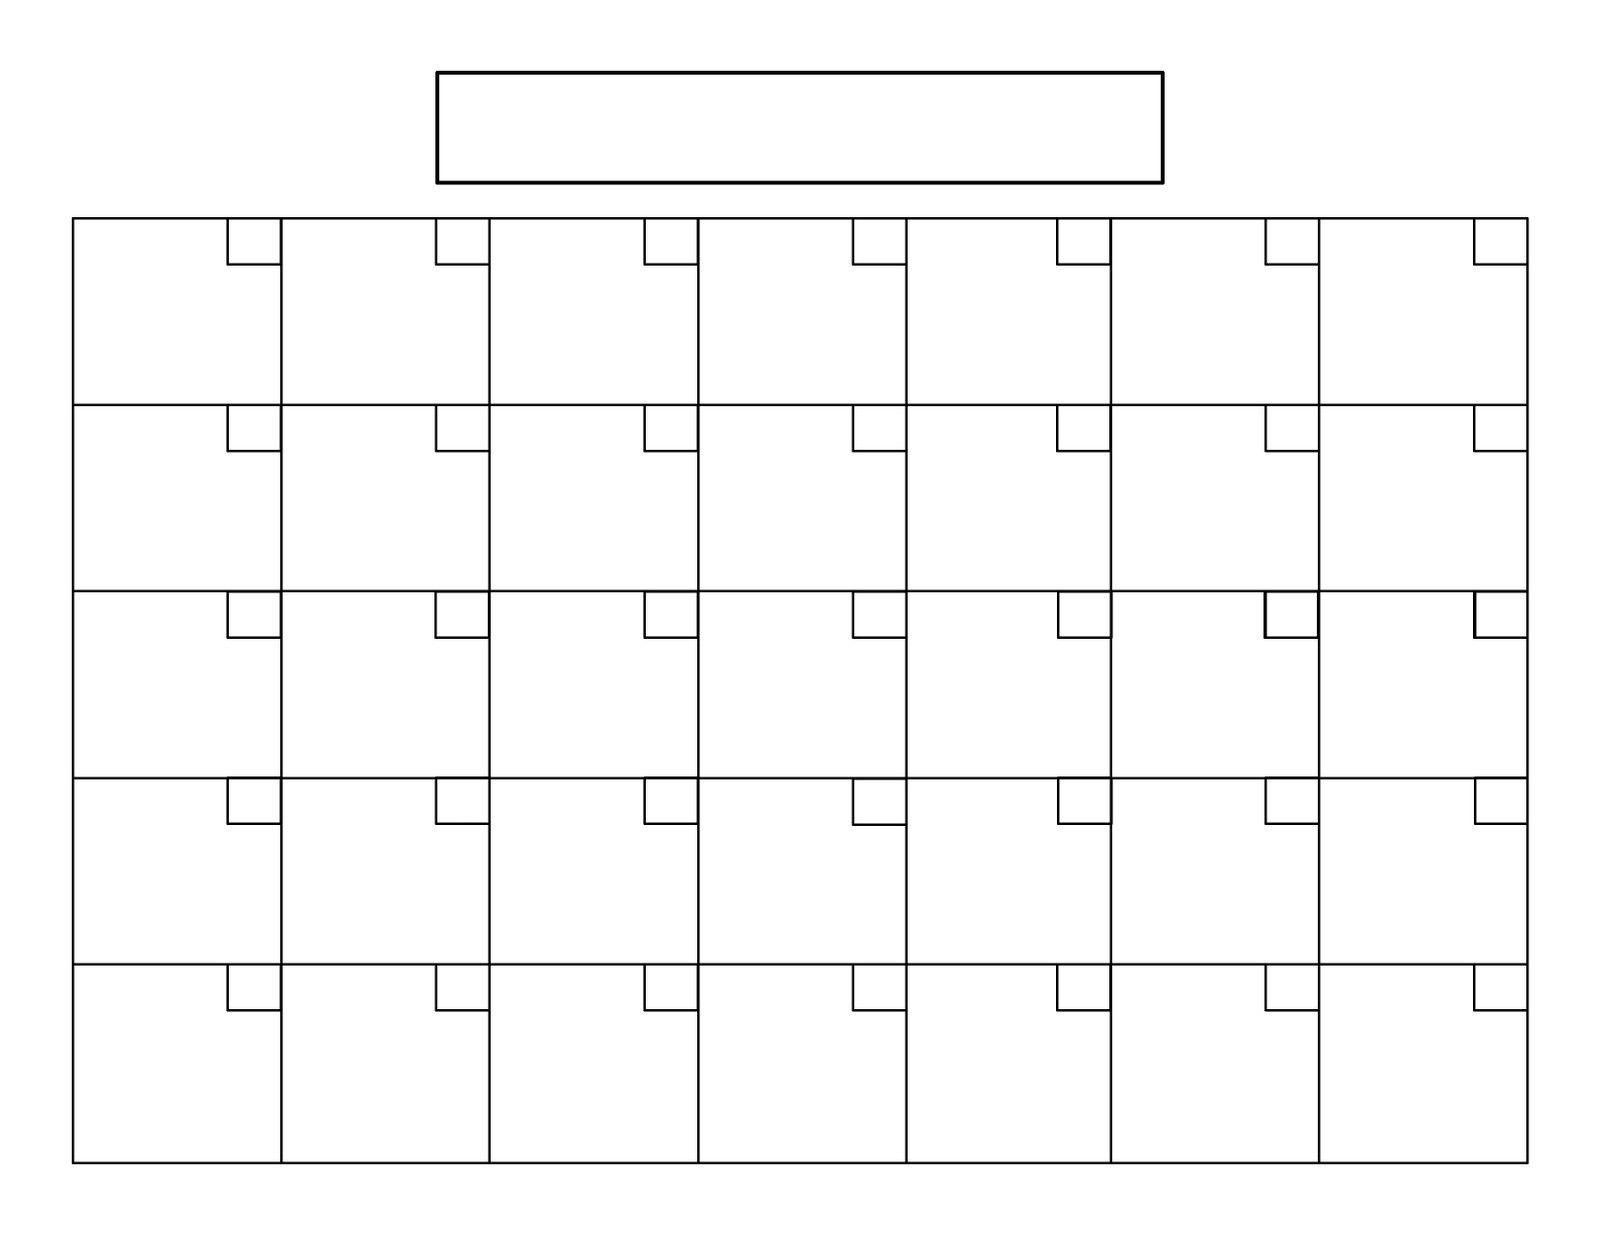 Printable 5 Day Calendar | Monthly Calendar Printable inside Free Printable 5 Day Monthly Calendar